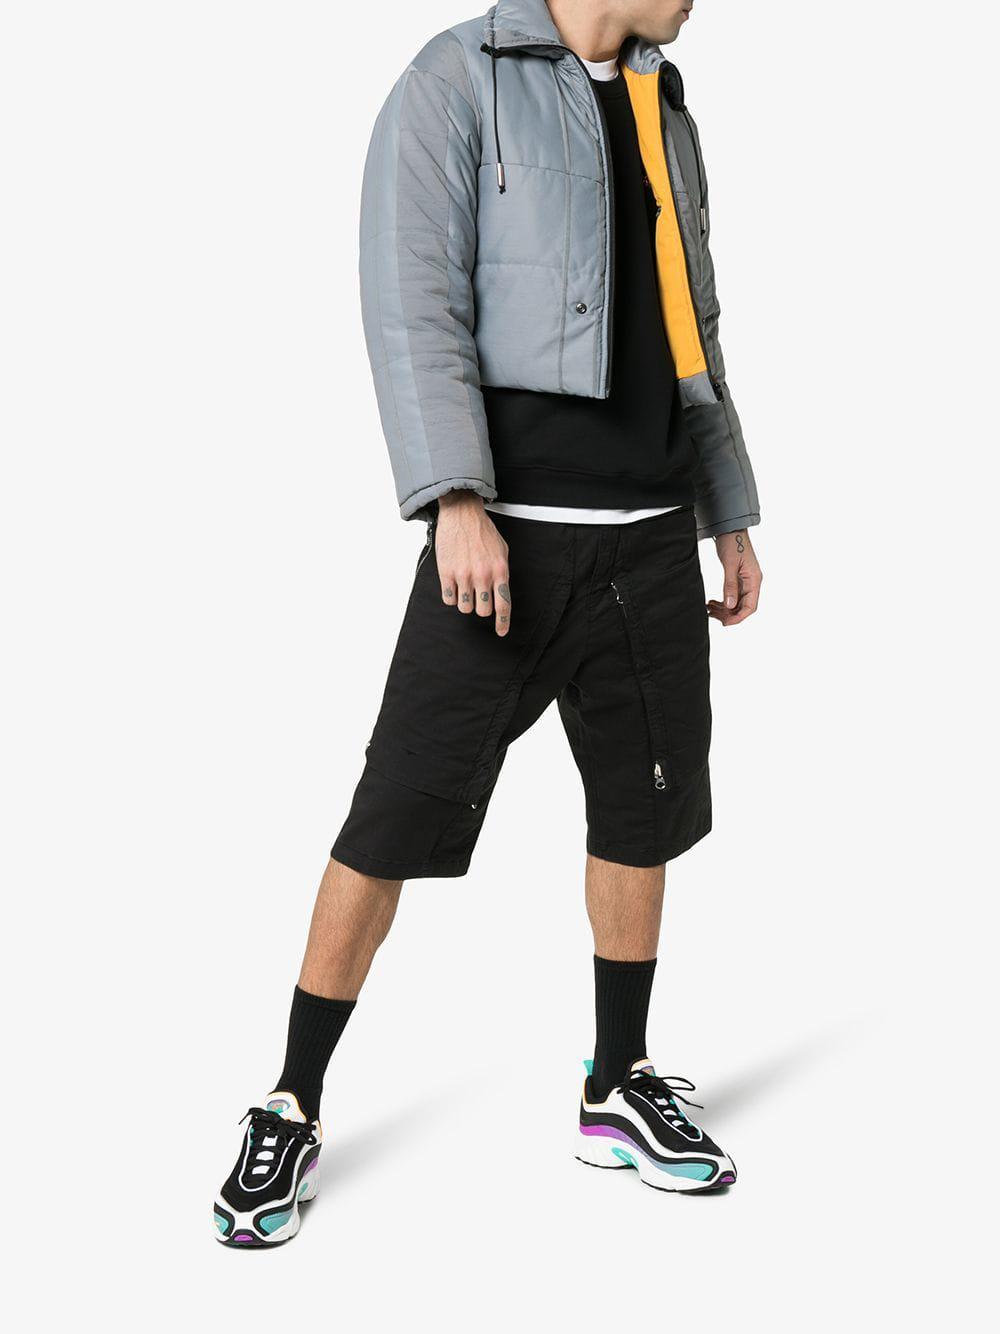 63ce06ee9a9c Lyst - Reebok Dmx Daytona Sneakers for Men - Save 1%